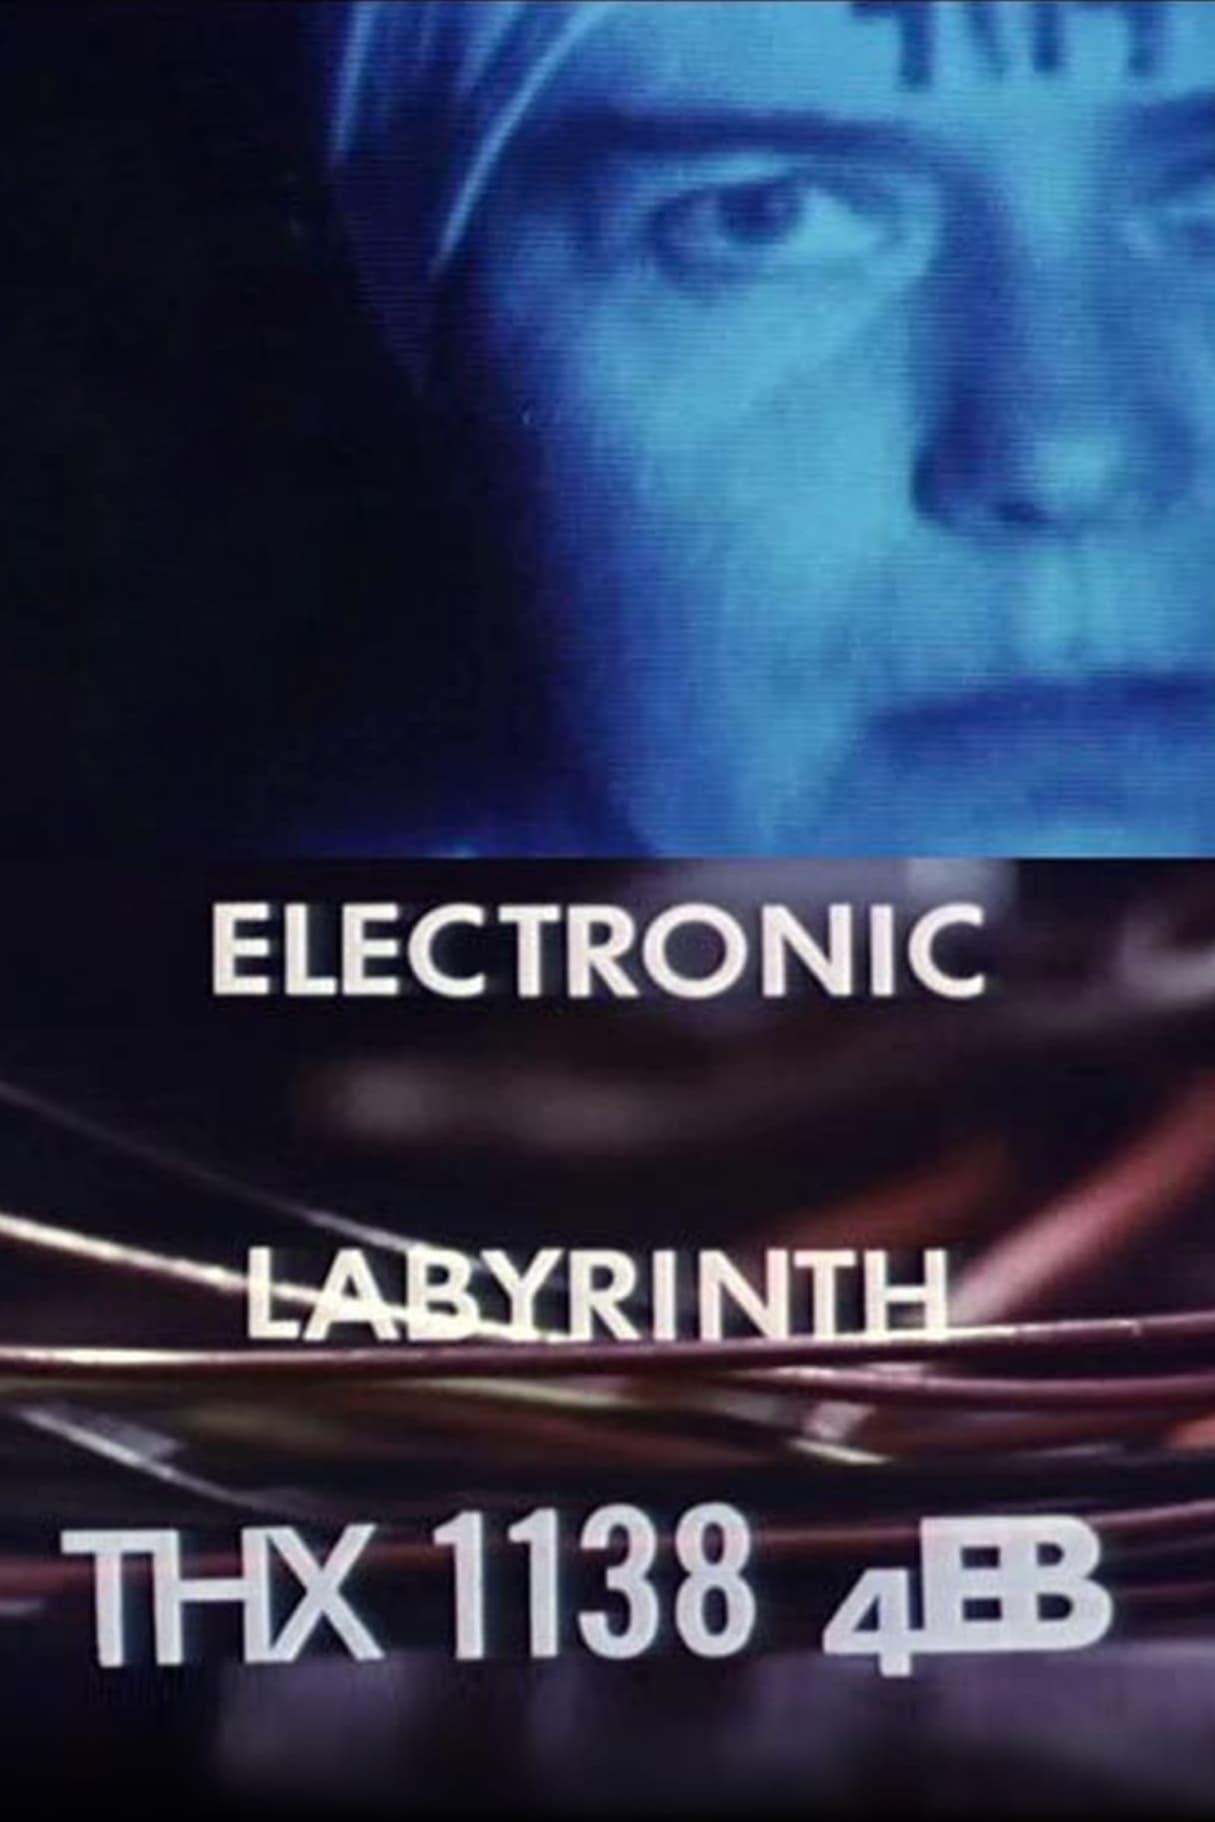 Electronic Labyrinth: THX 1138 4EB (1967)